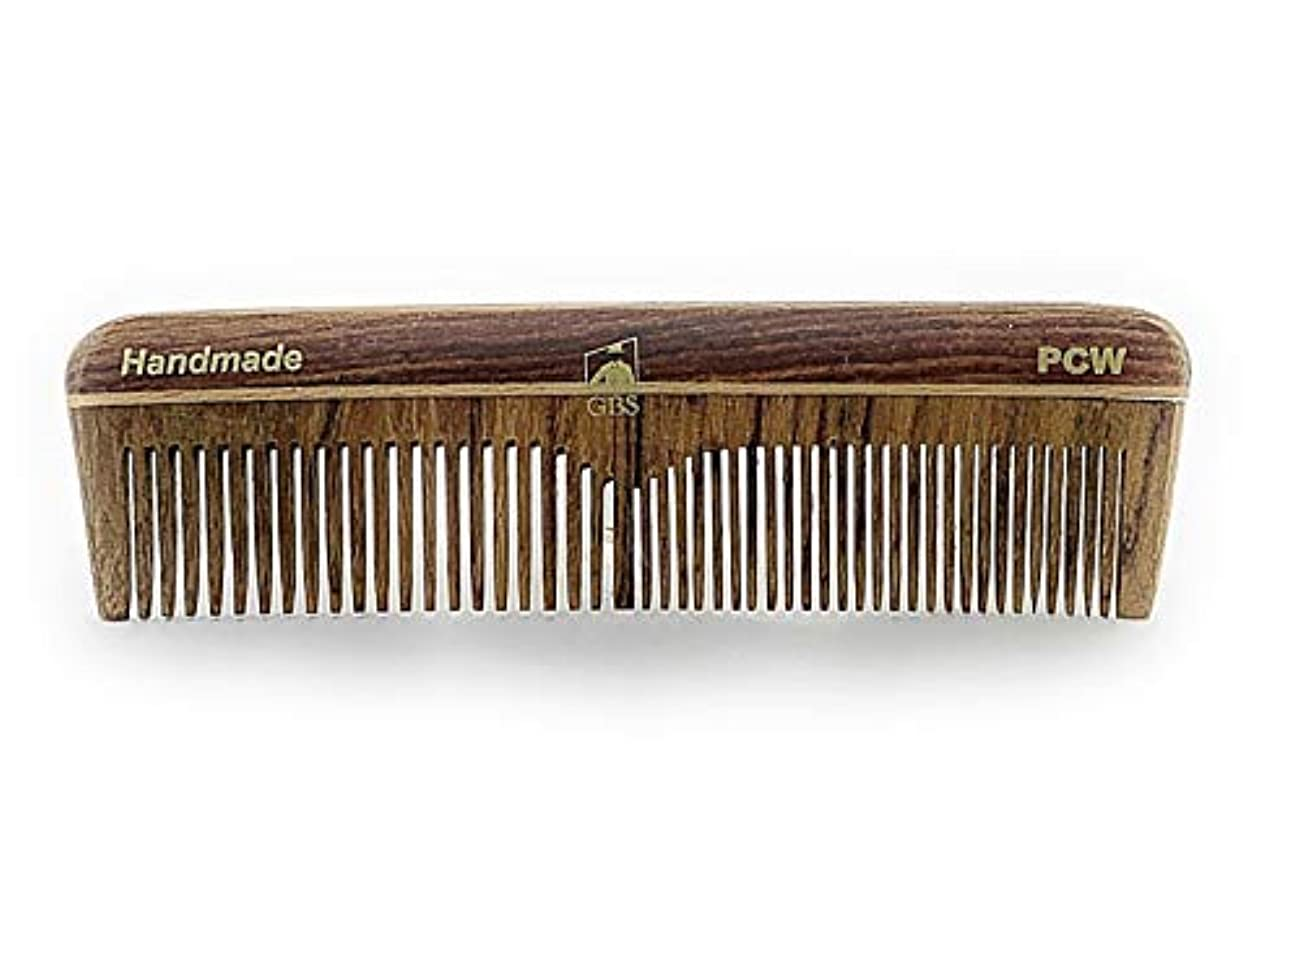 GBS Natural Wood Handmade Pocket Beard and Hair Comb - Comb 5